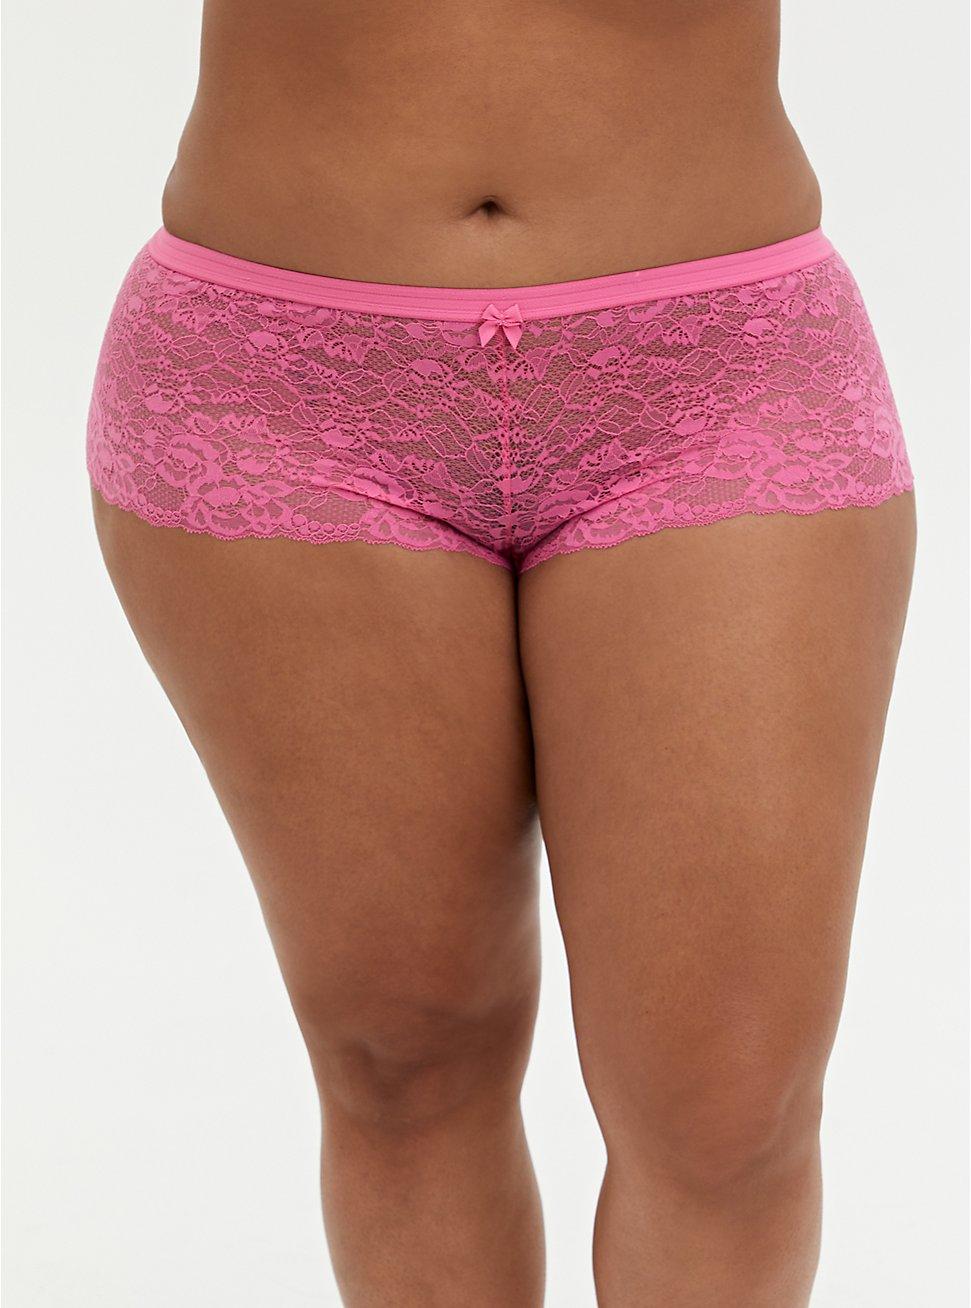 Pink Lace Cheeky Panty, AZAELEA PINK, hi-res